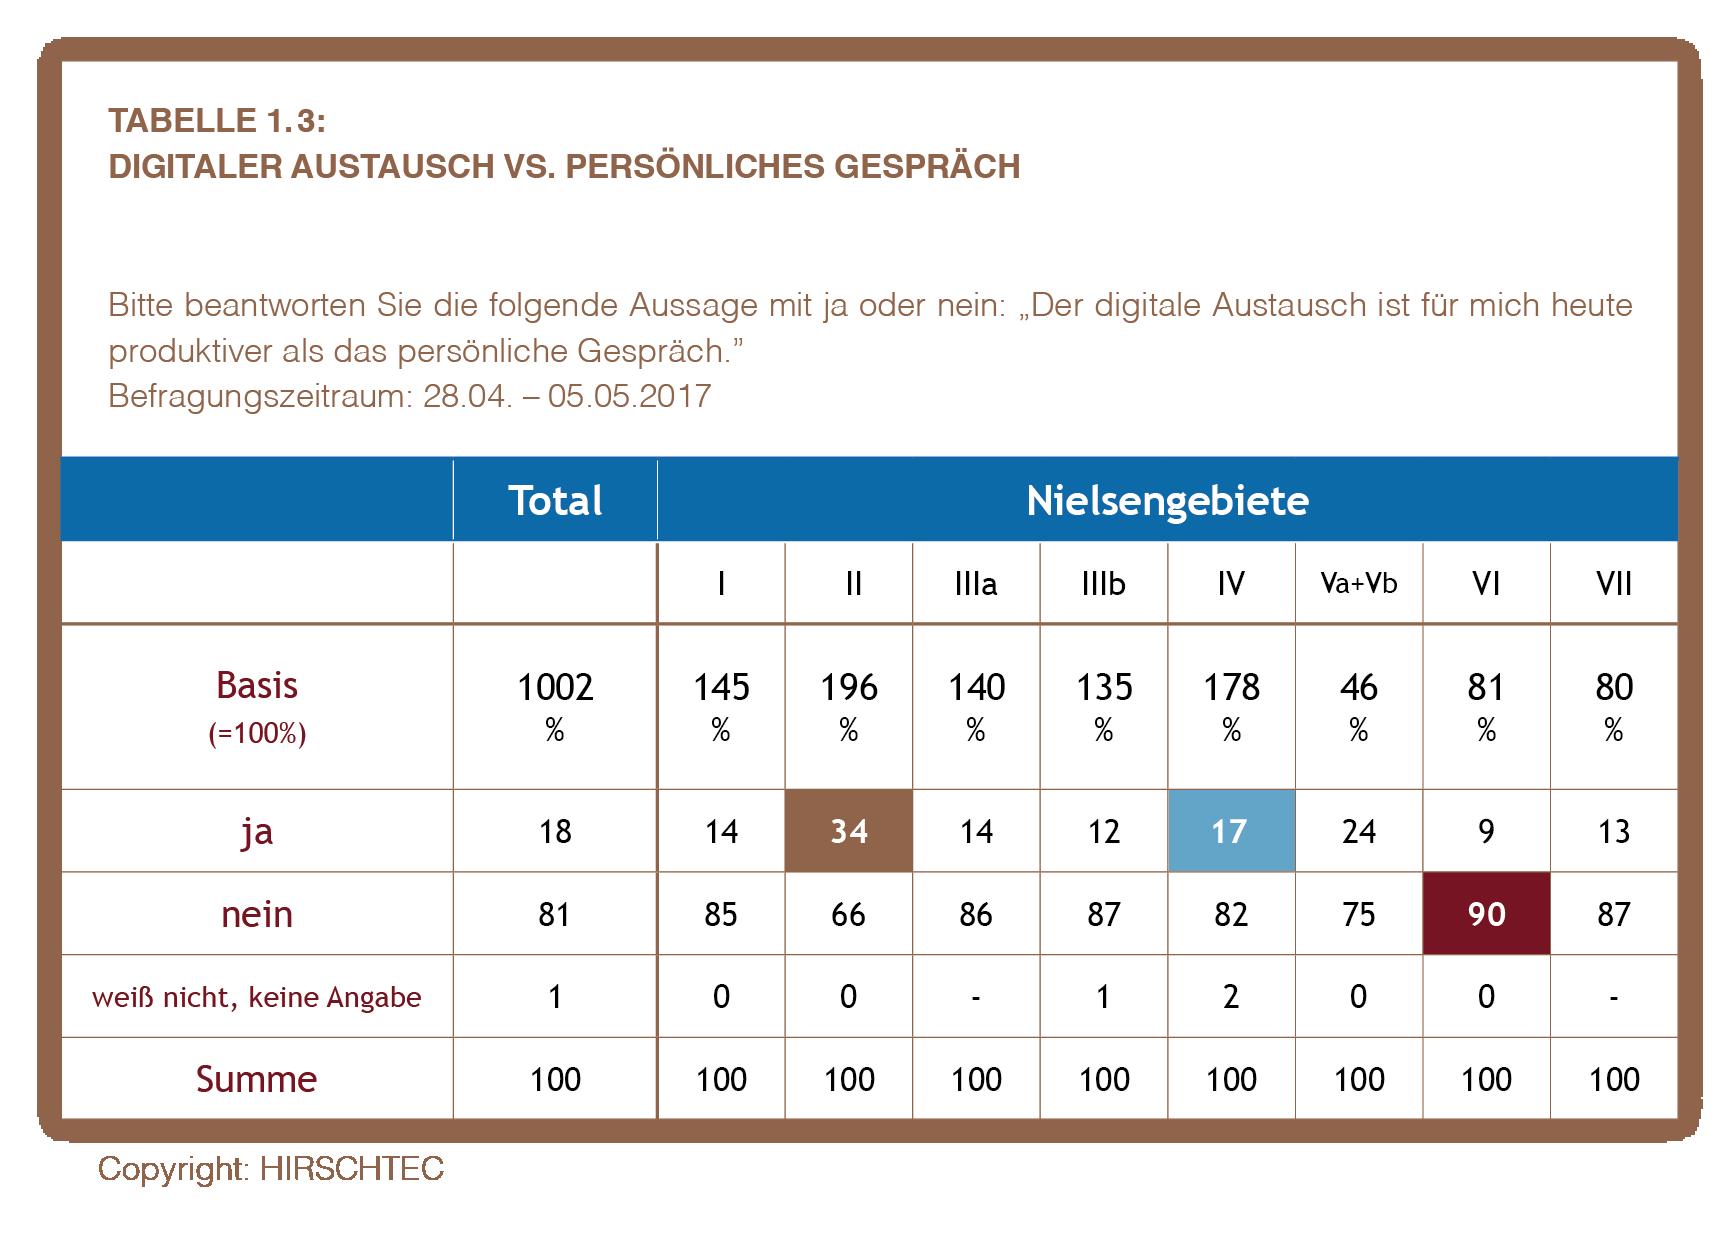 Bayern Tabelle 1.3